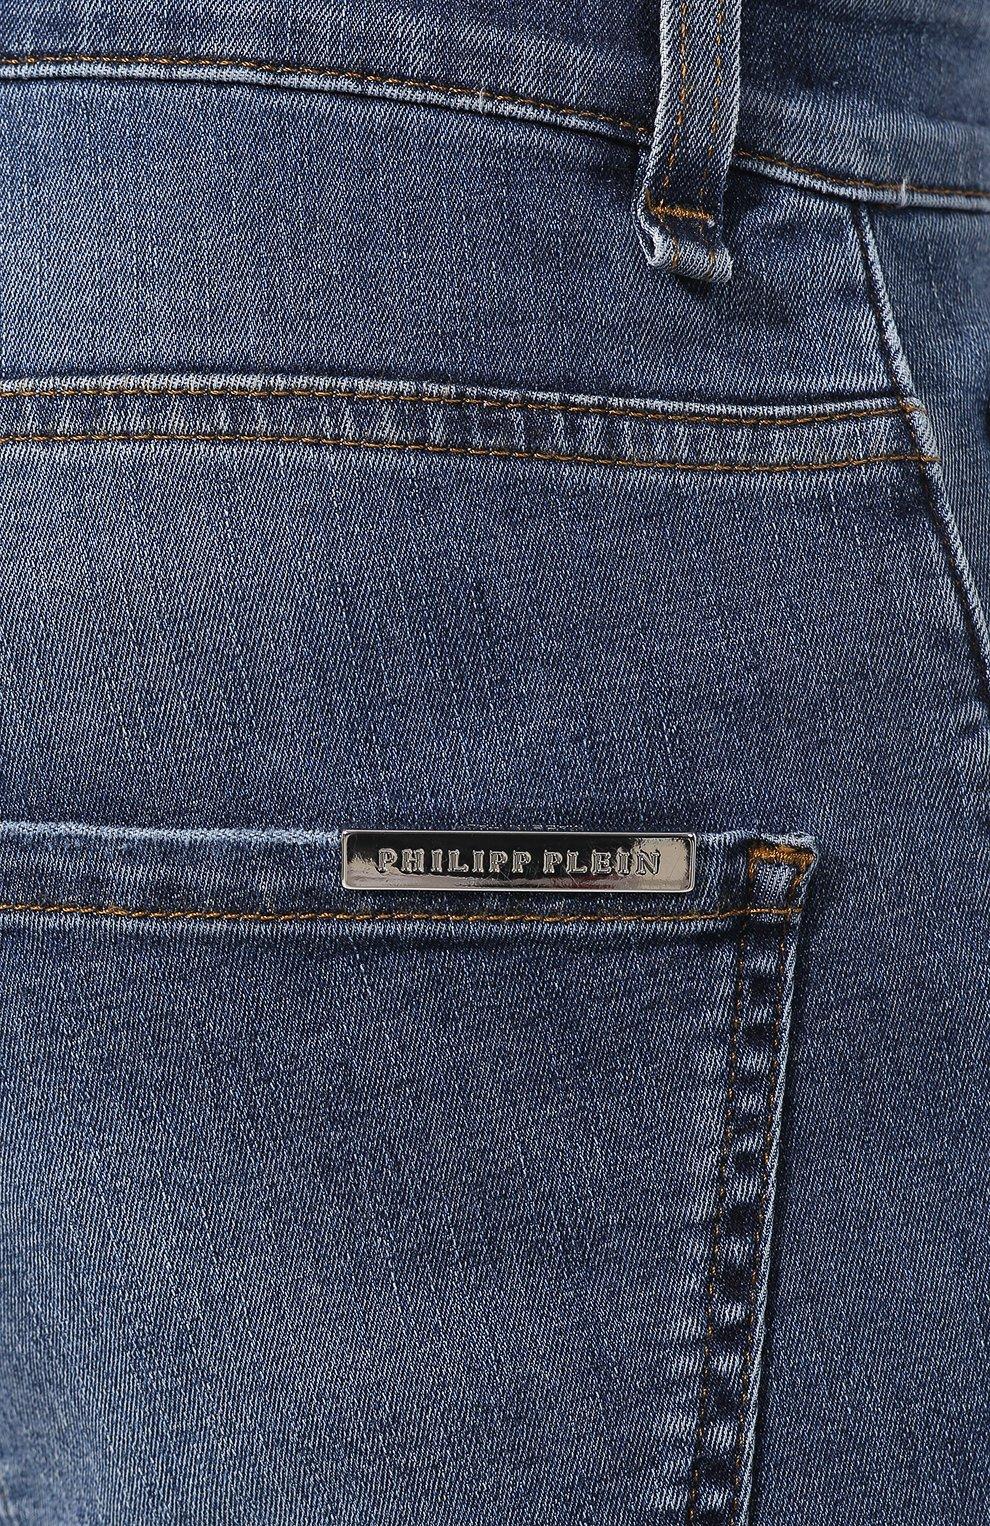 Джинсы Philipp Plein голубые | Фото №5